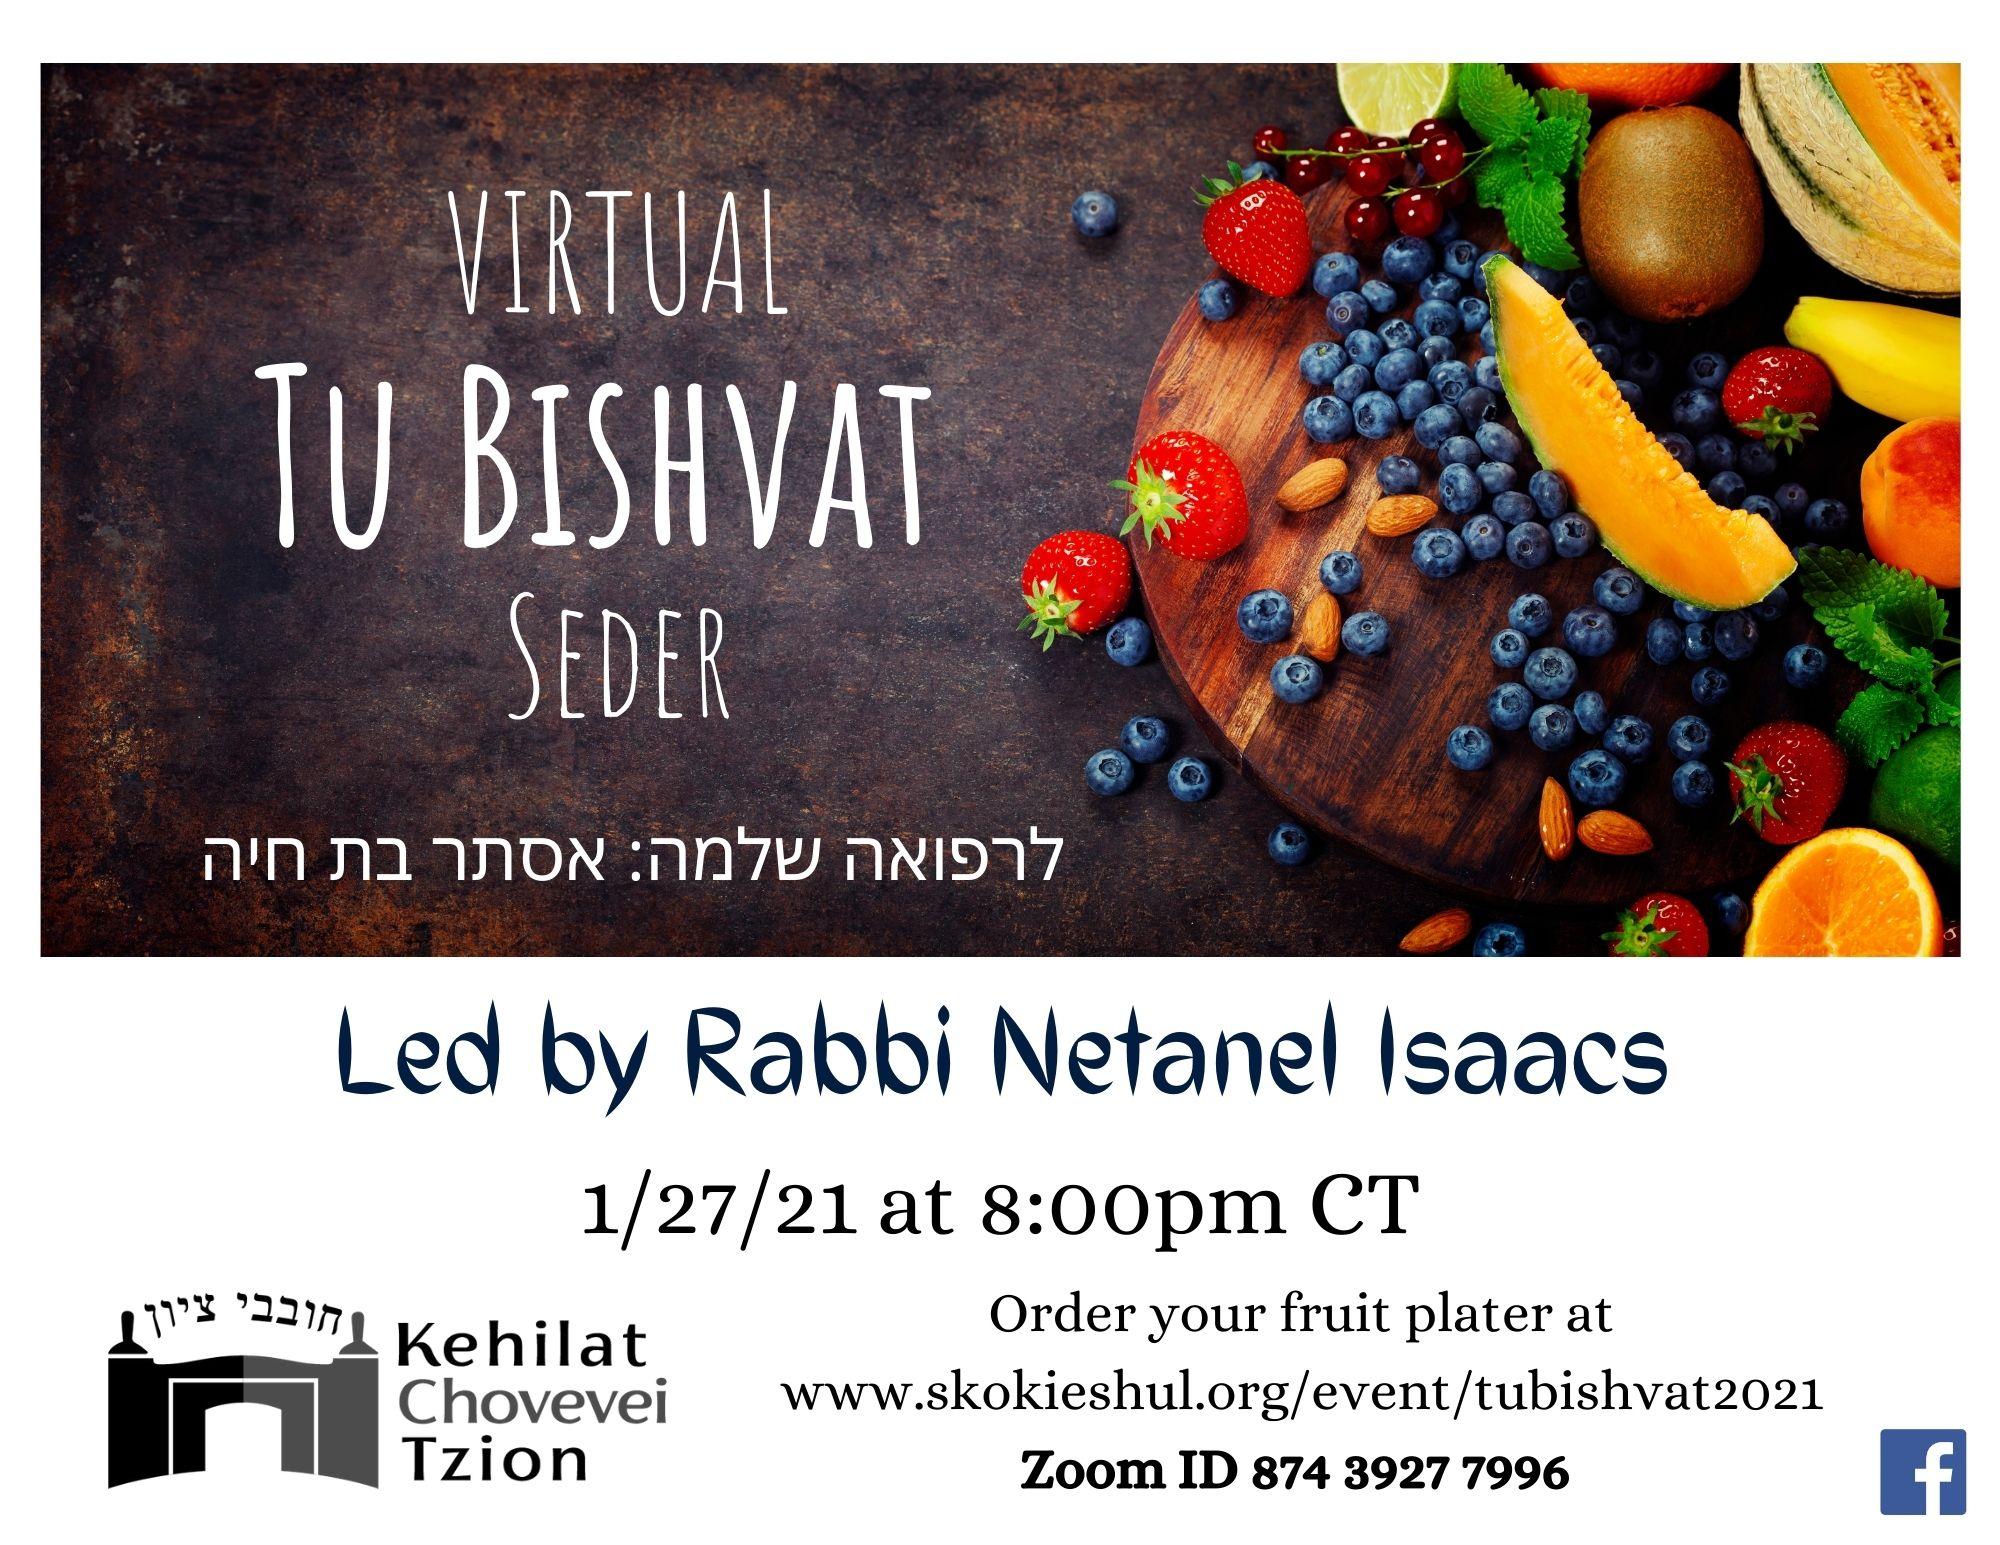 Tu Bishvat Seder - Event - Kehilat Chovevei Tzion